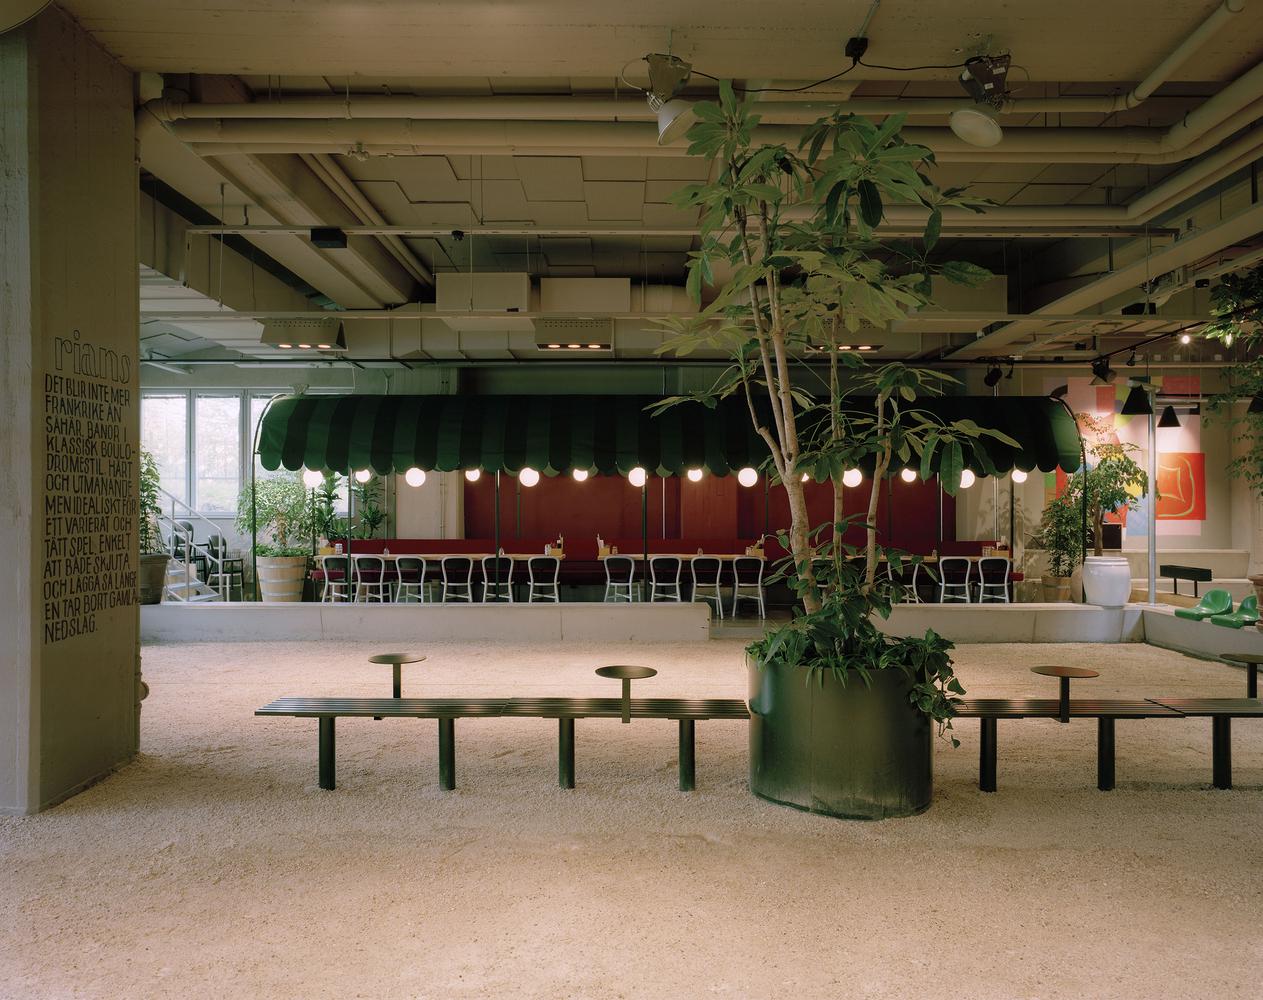 Boulebar Concept Restaurant Bornstein Lyckefors Building Of The Year 2020